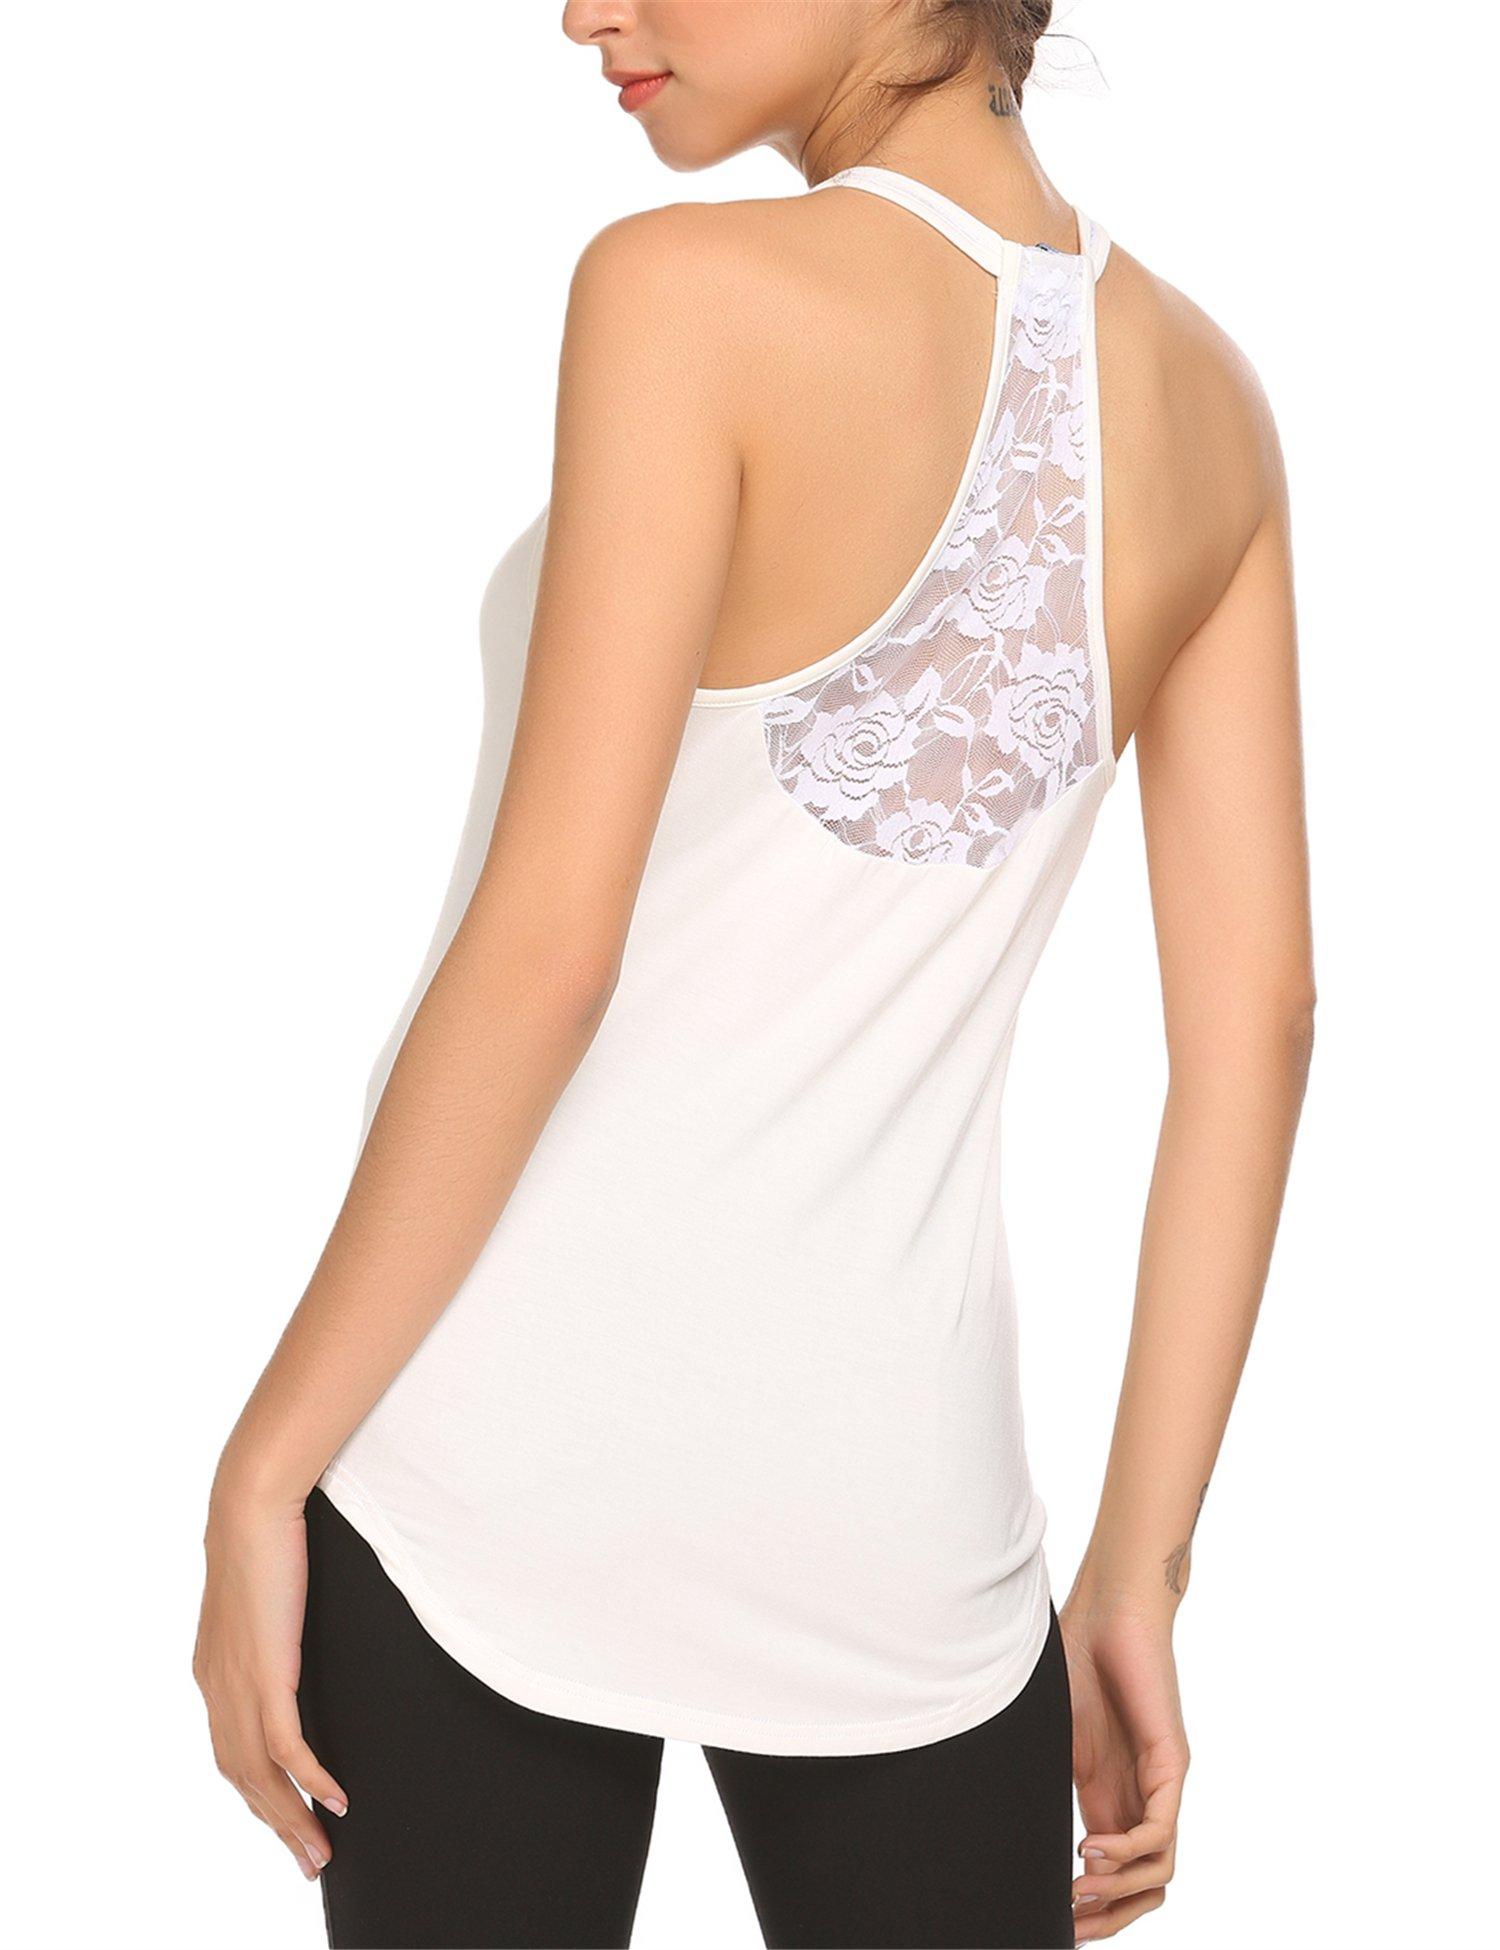 Mofavor Women's Sleeveless Crochet Lace Camisole Vest Halter Racerback Tank Top,White,Large by Mofavor (Image #1)